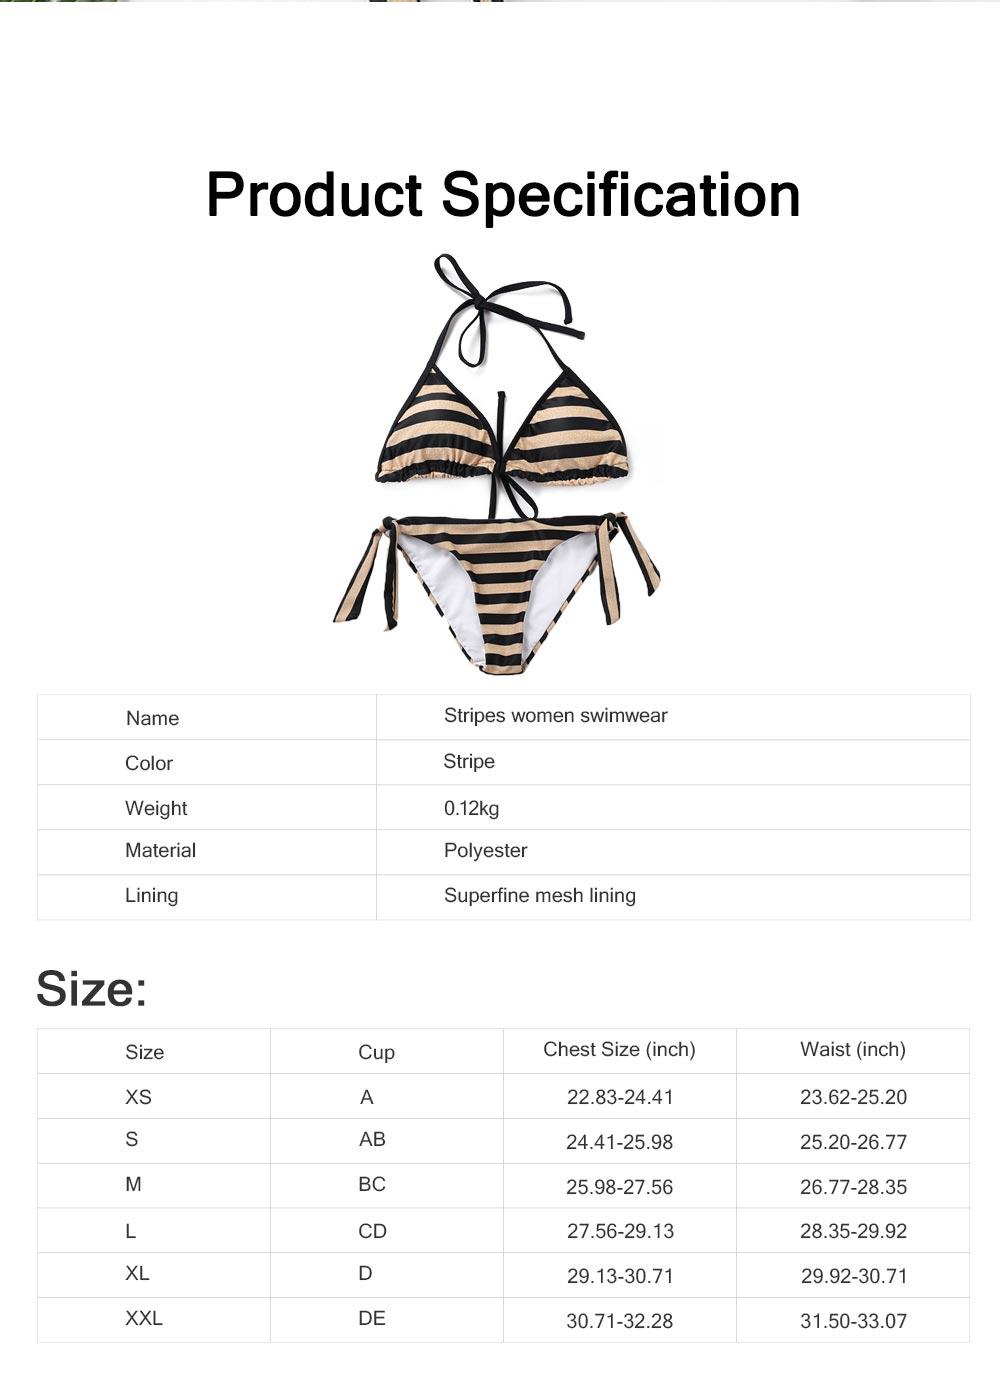 Delicate Minimalist Stripes Pattern Ladies Swimsuit Bikini Elastic Skin-friendly Sexy Lace-up Swimwear for Ladies 6